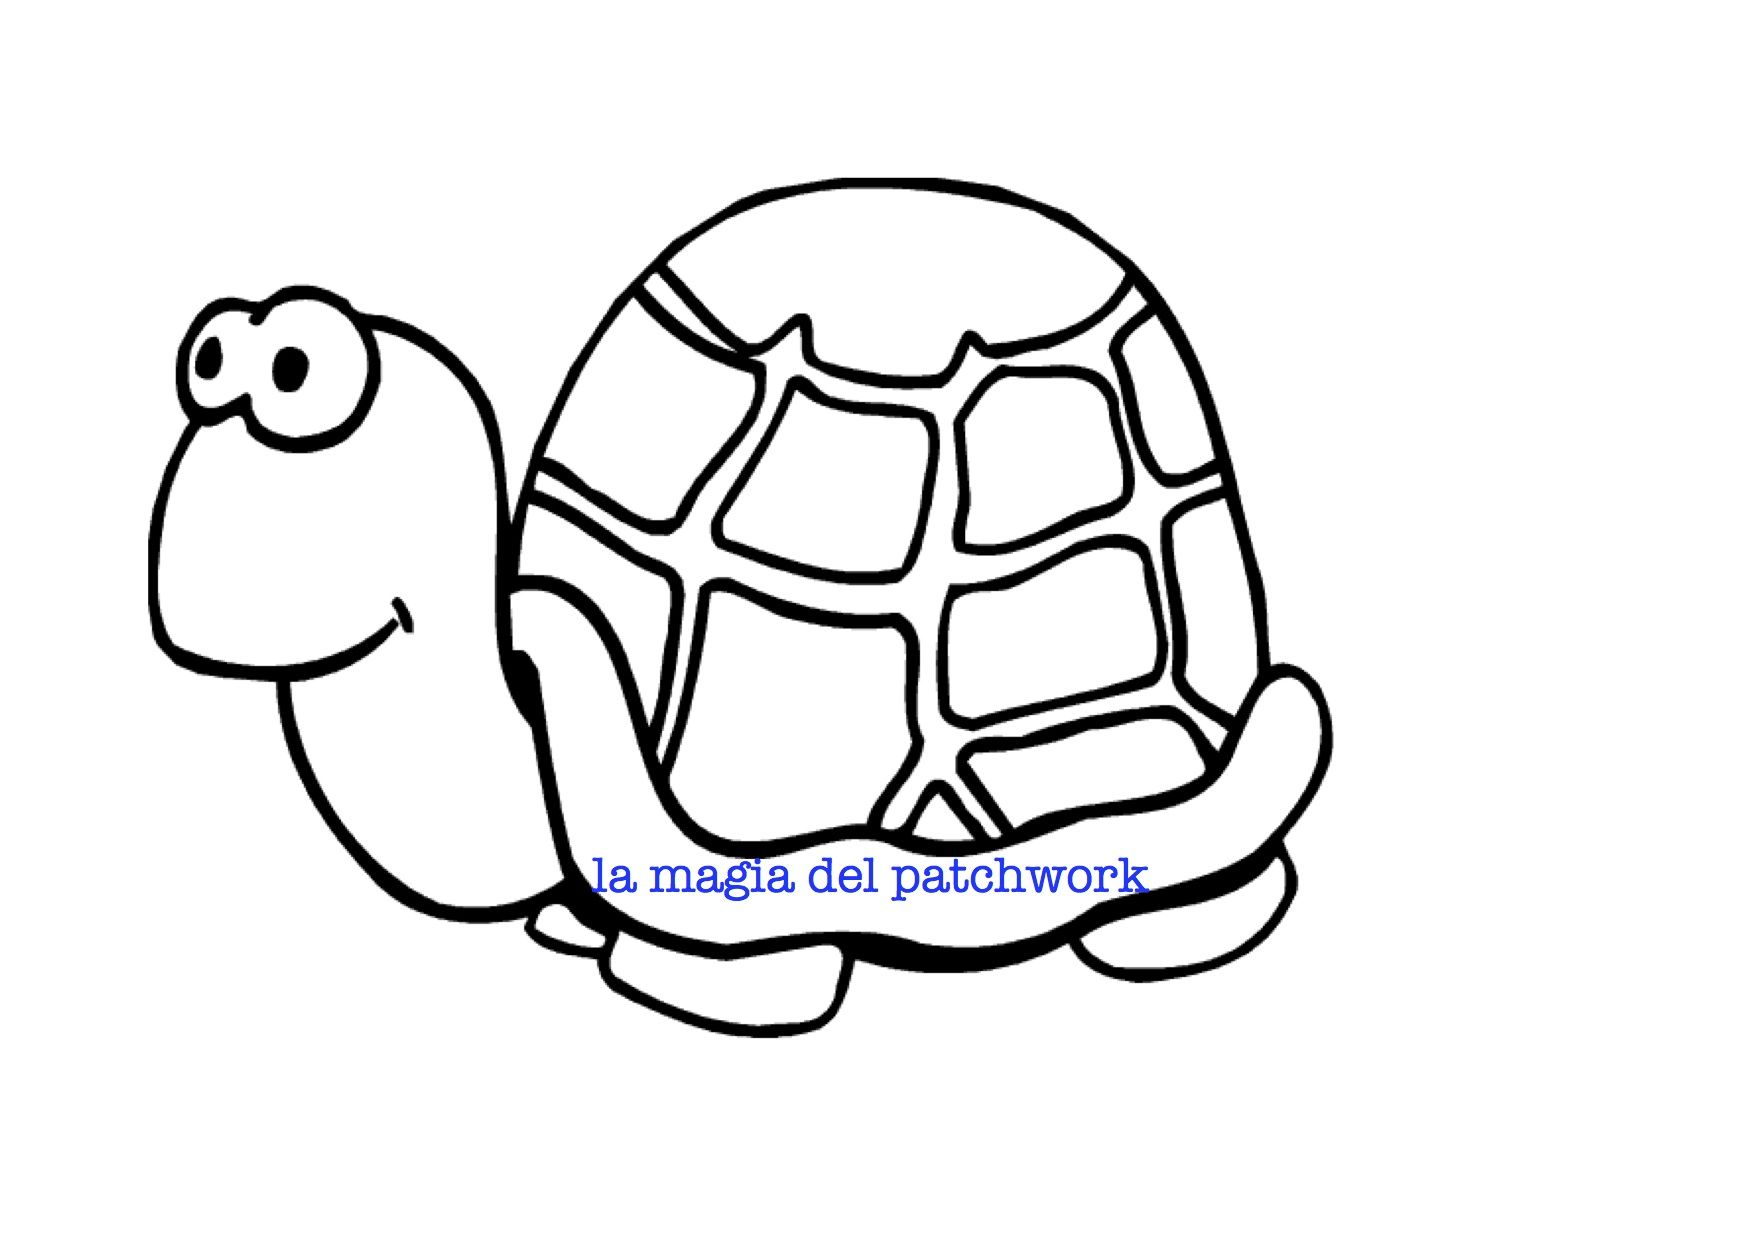 La Tortuga Plantilla Para Imprimir Turtle Coloring Pages Coloring Pages Cute Coloring Pages